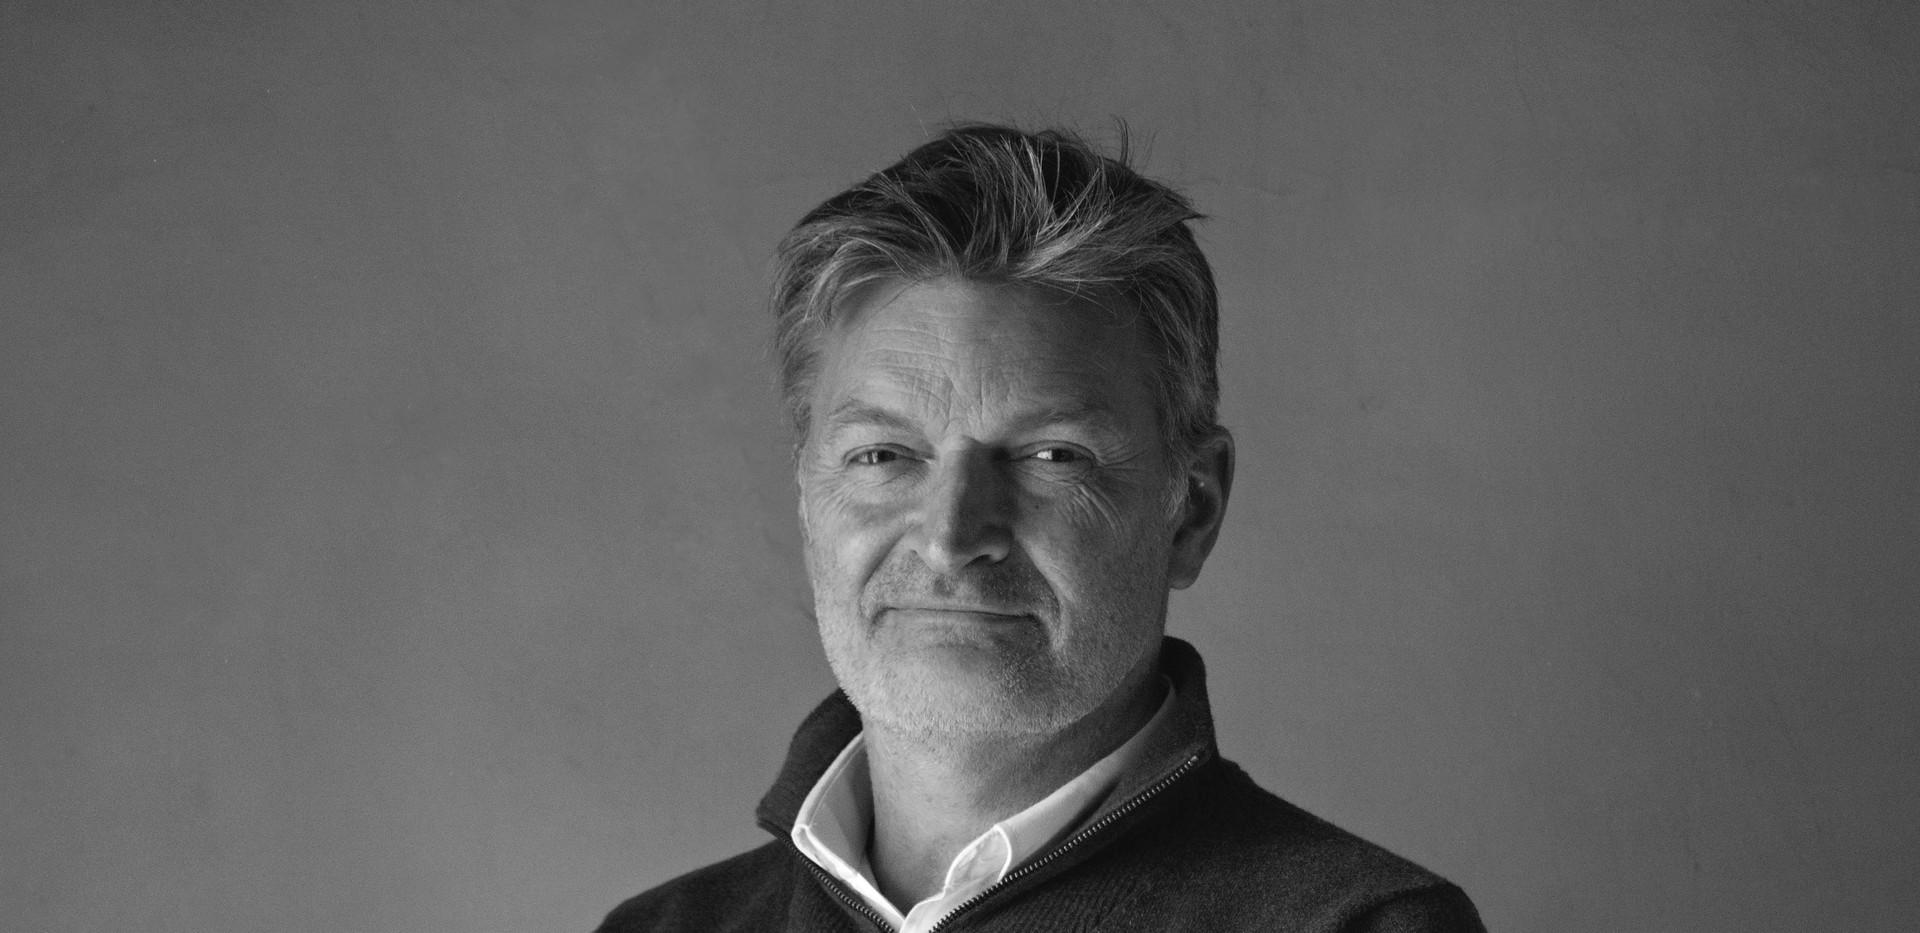 Luke McAdam - Director & Architect